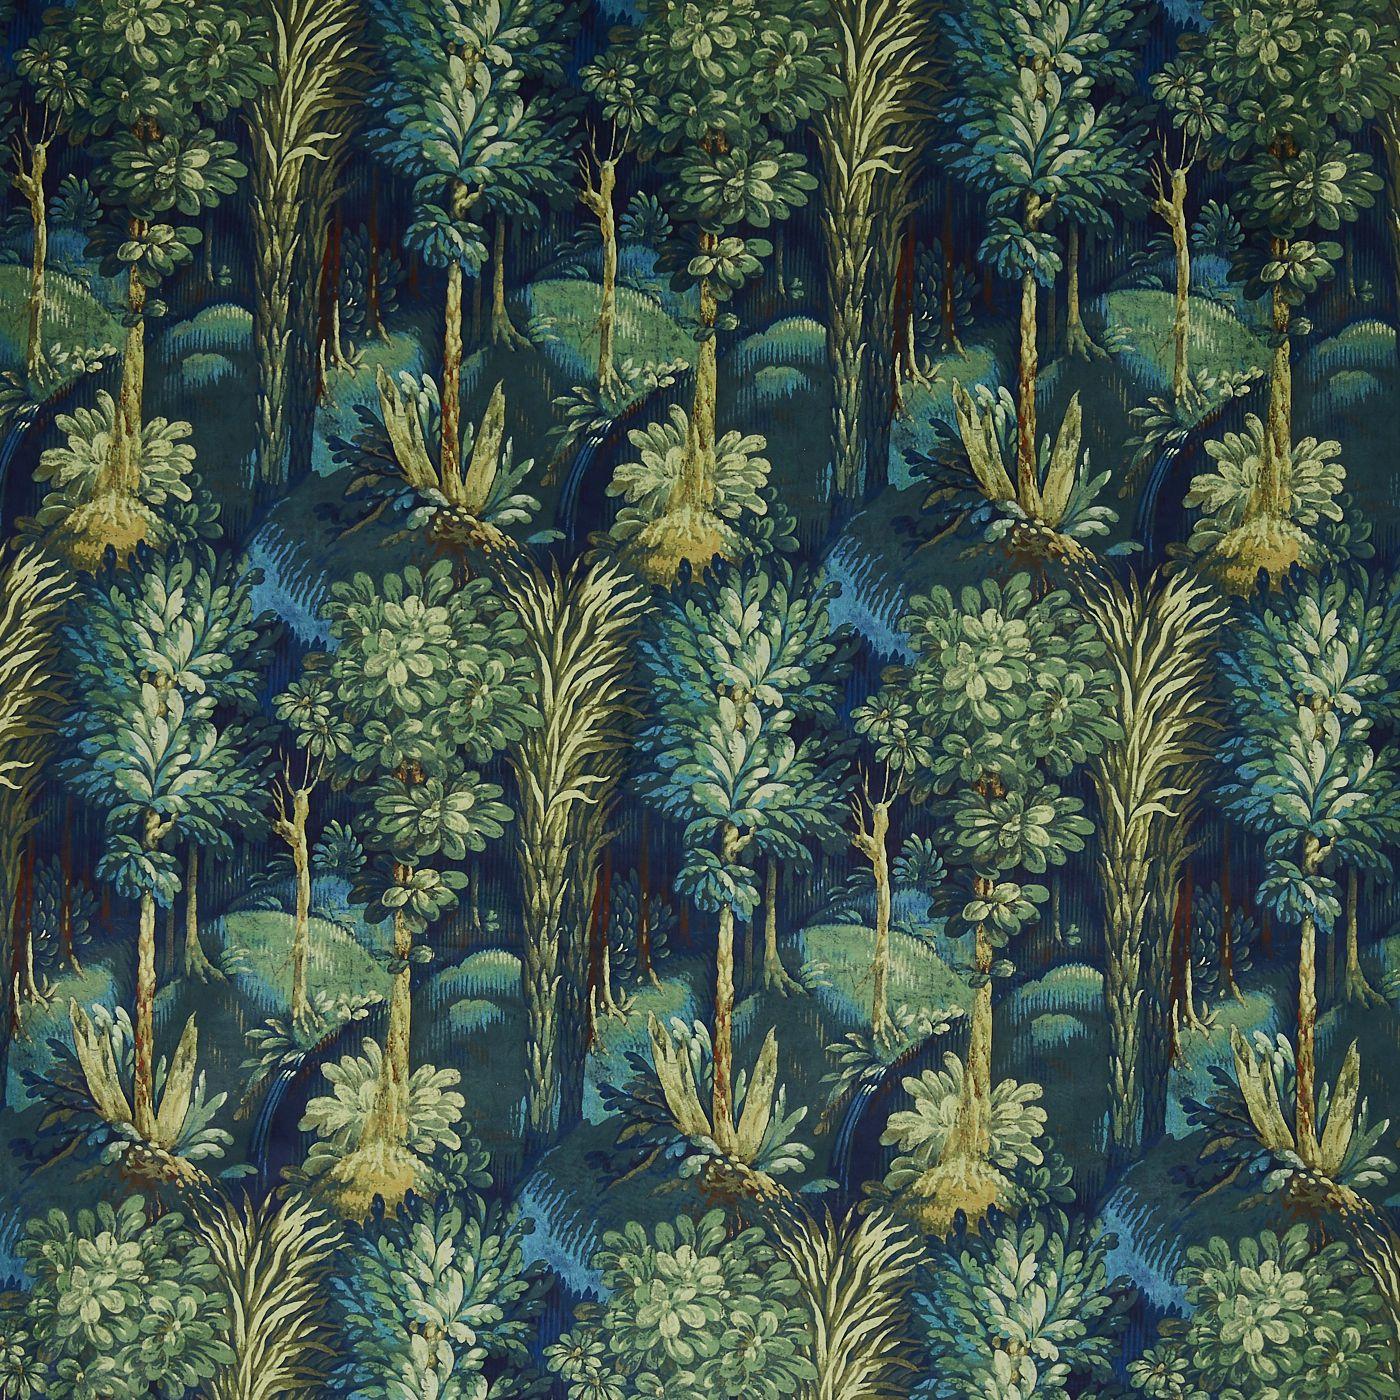 3801 710 FORBIDDEN FOREST SAPPHIRE